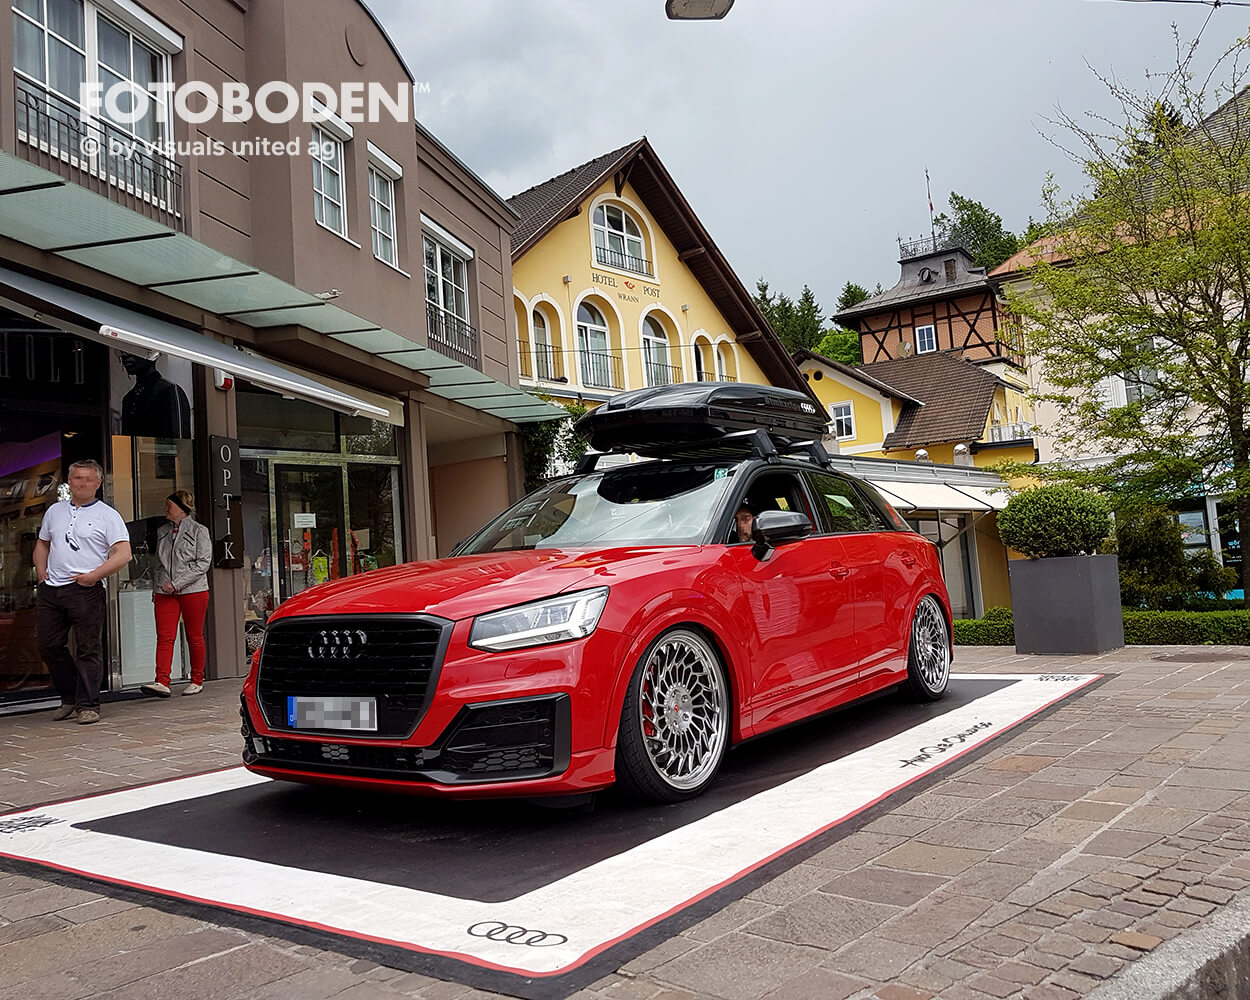 Audi Fotoboden Flooring Fußboden Bodengestaltung Floorminder Bodendruck Werbung Fußbodenwerbung Bodenwerbung Merchandising Advertising Visualmerchandising1